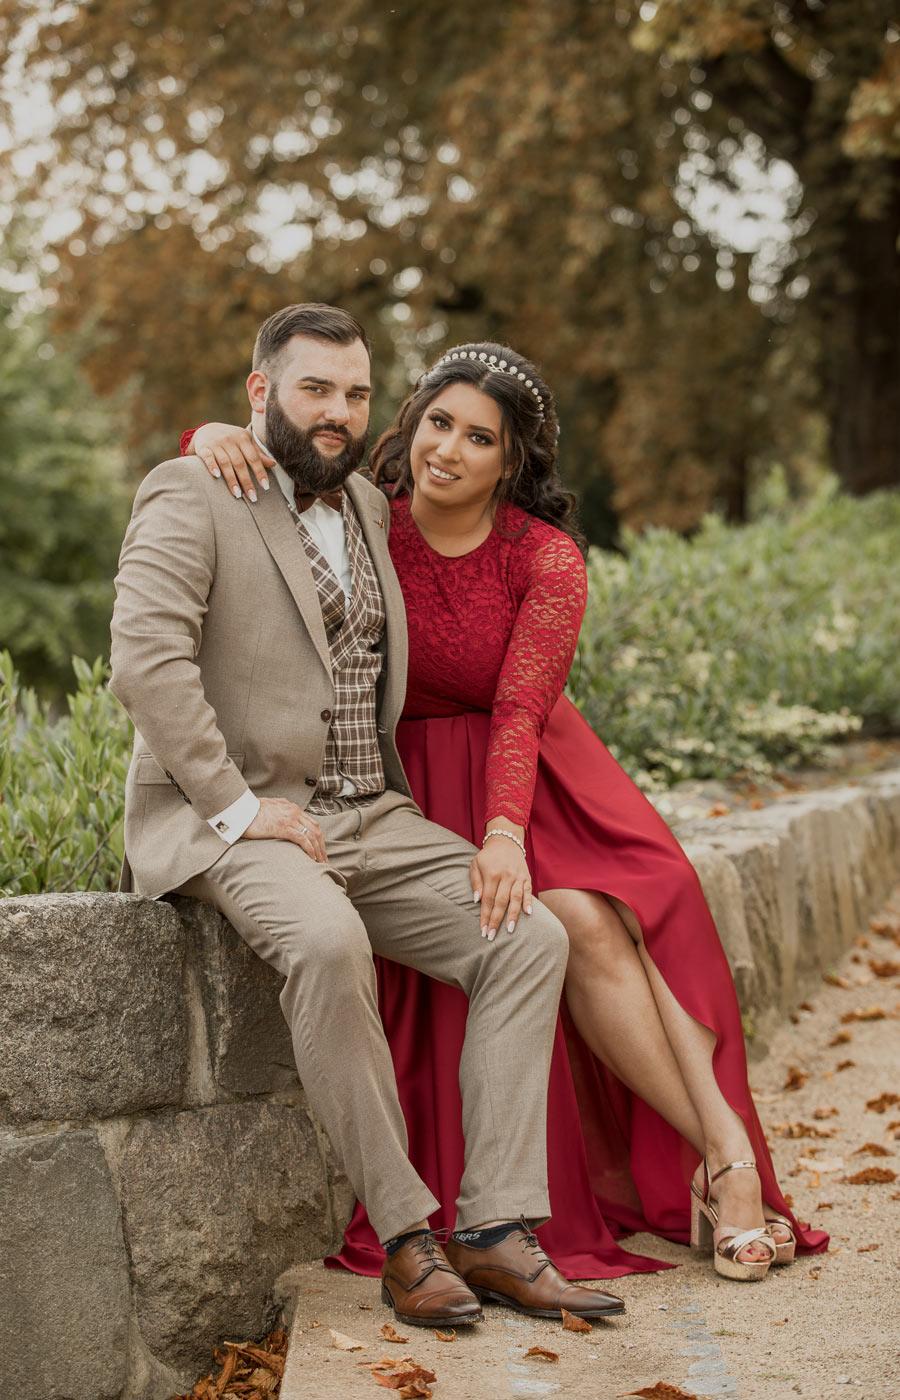 Studioart-Photography-Hochzeitsshooting-Oktober-5